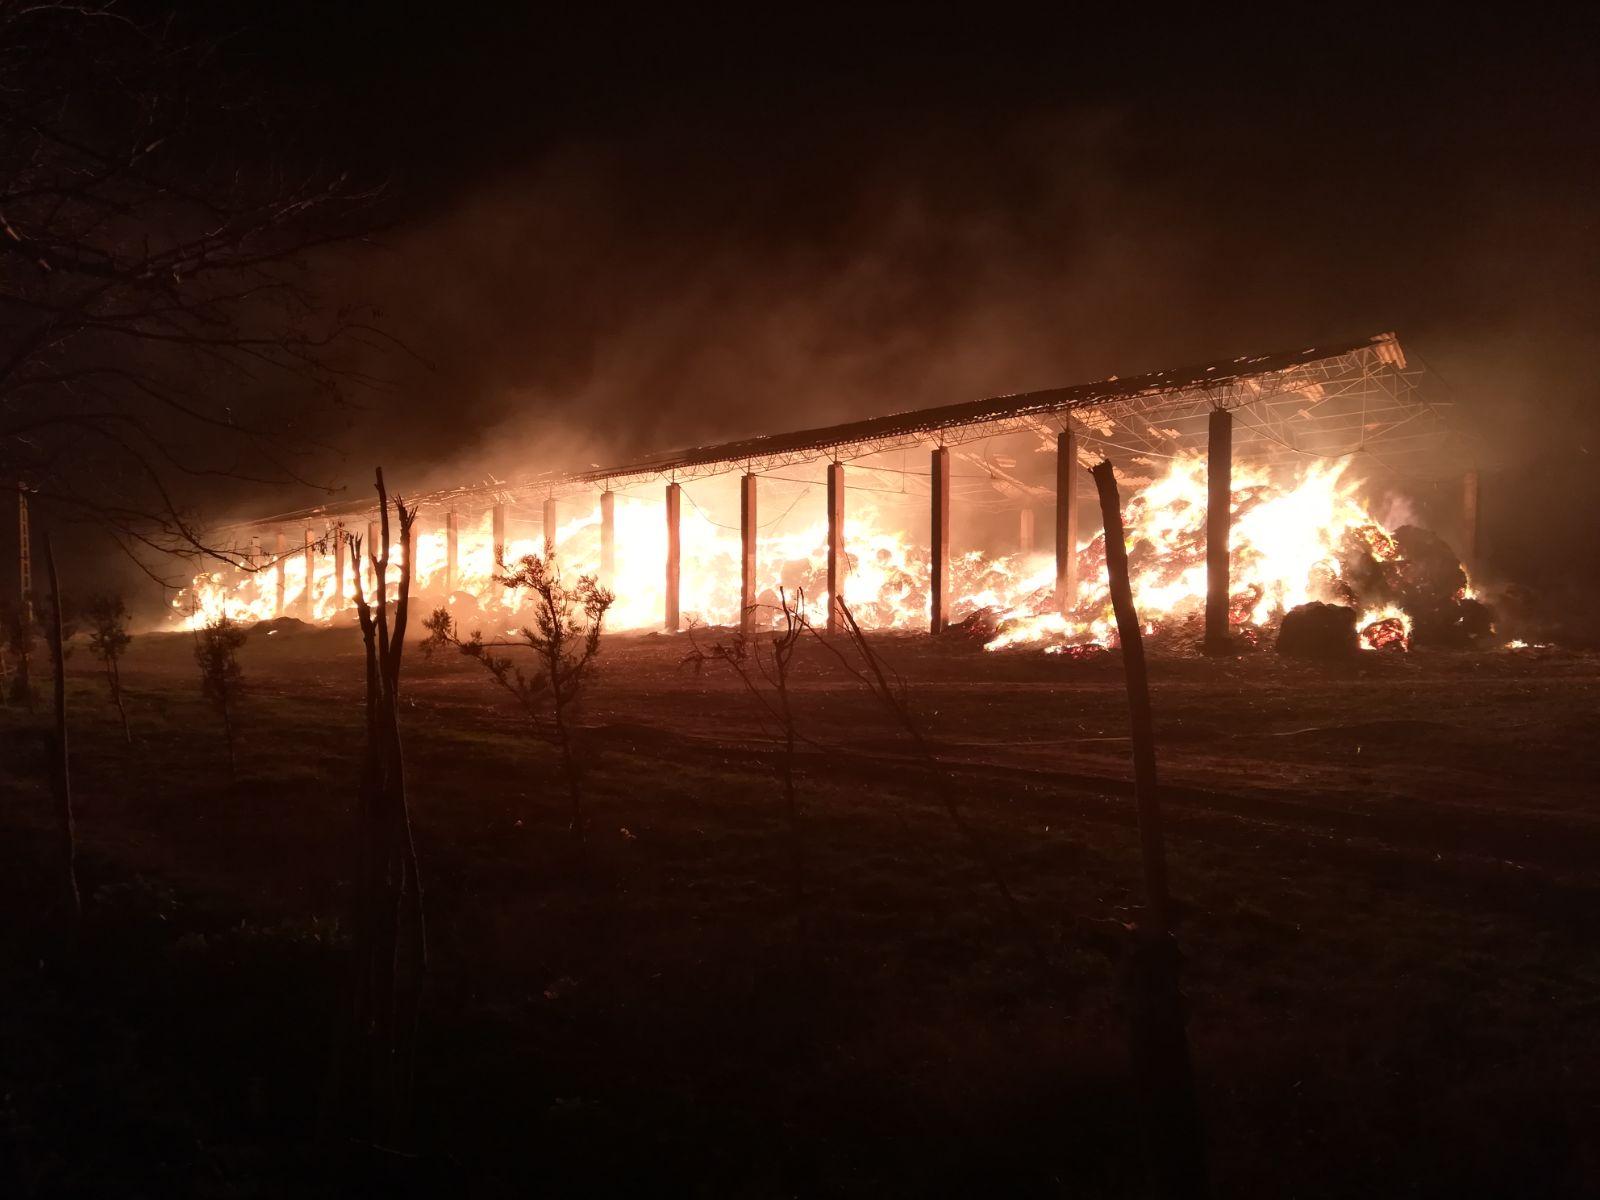 incendiu herghelie mangalia